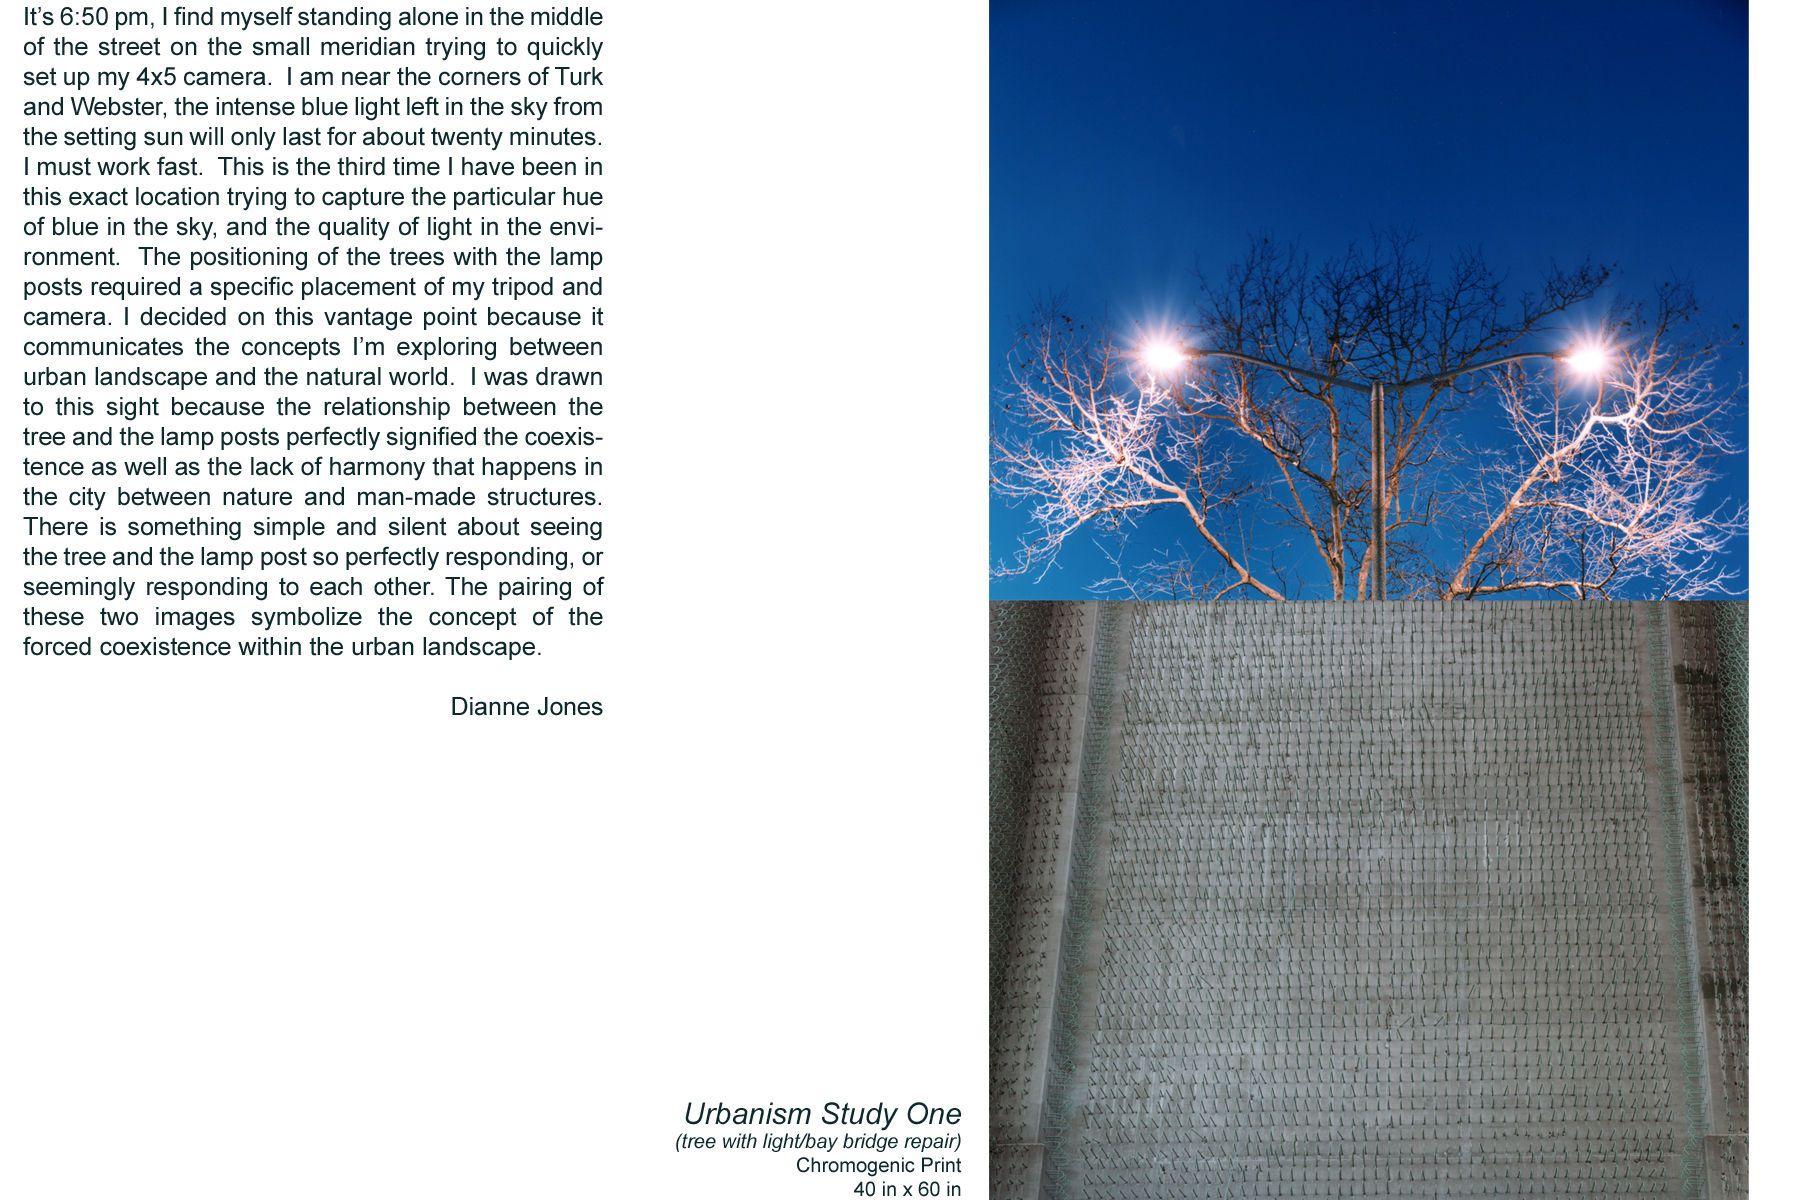 1urbanism_study01.jpg